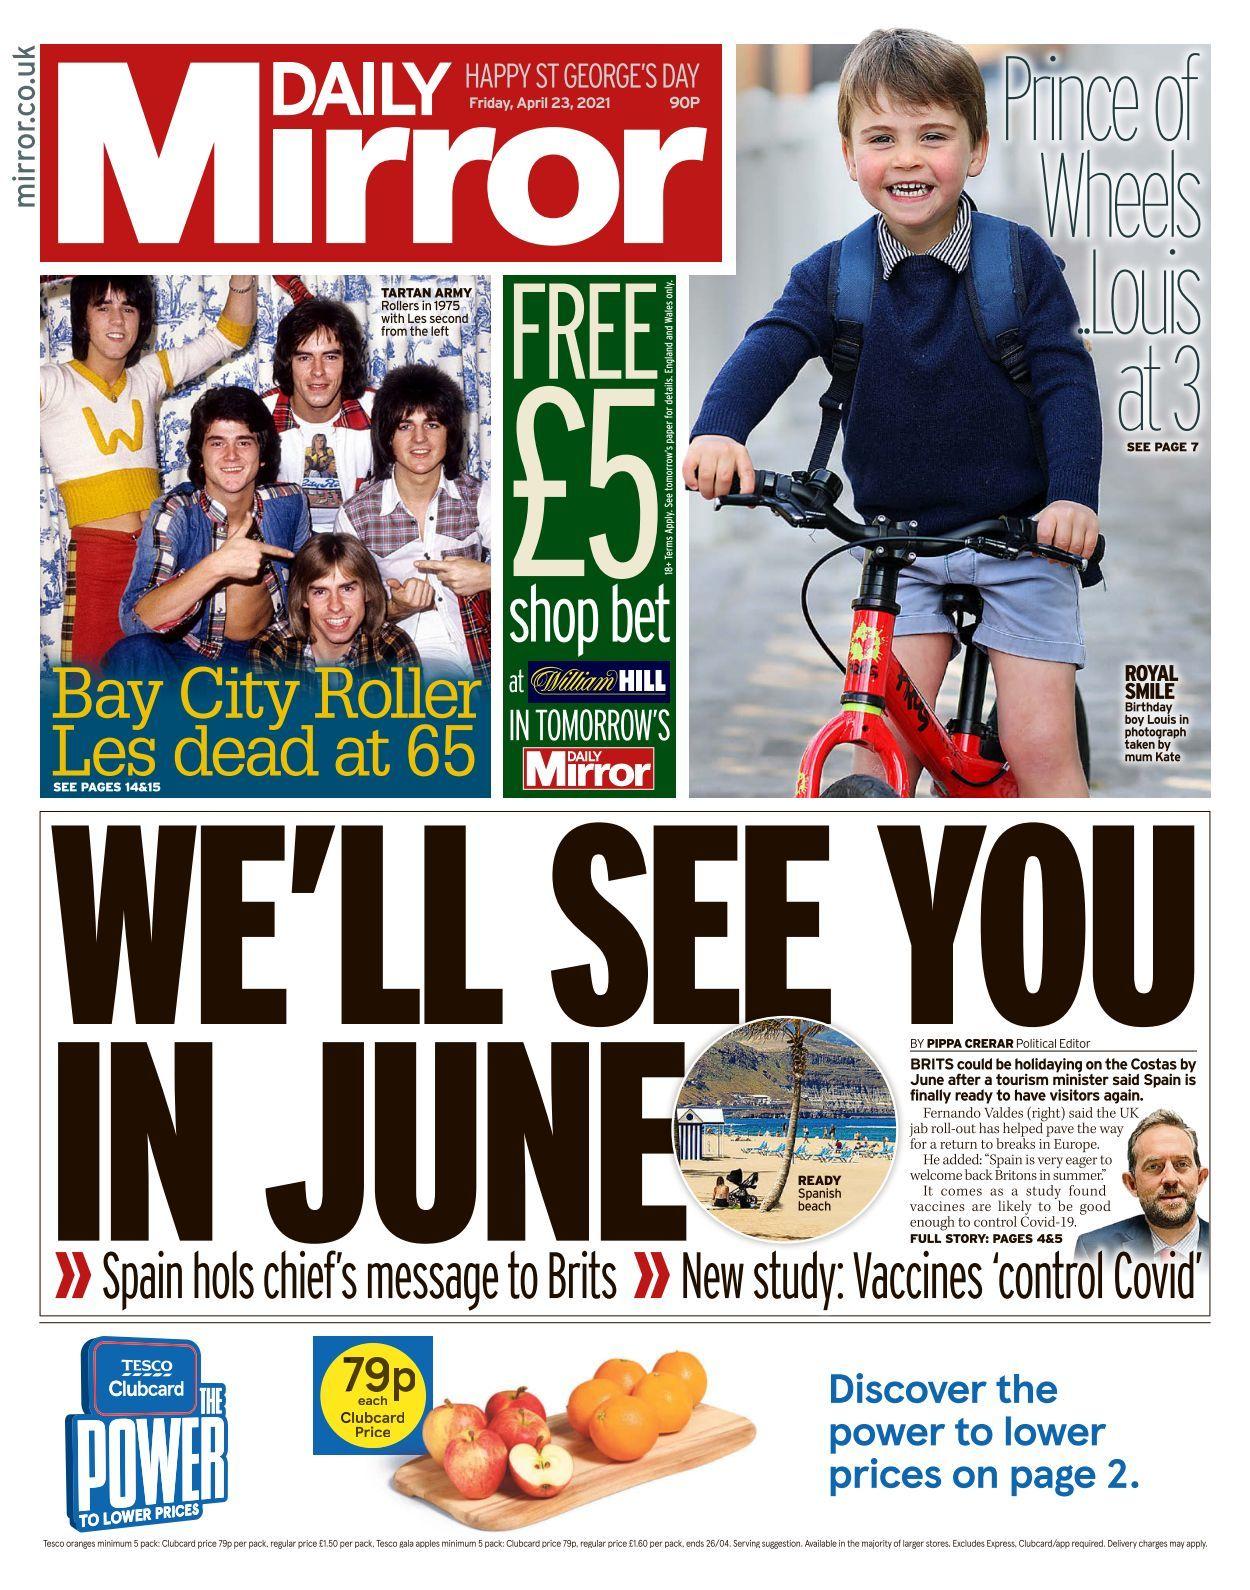 St Brendan Ormond Beach Christmas Eve Dec 24 2021 Mass Schedule Daily Mirror 2021 04 23